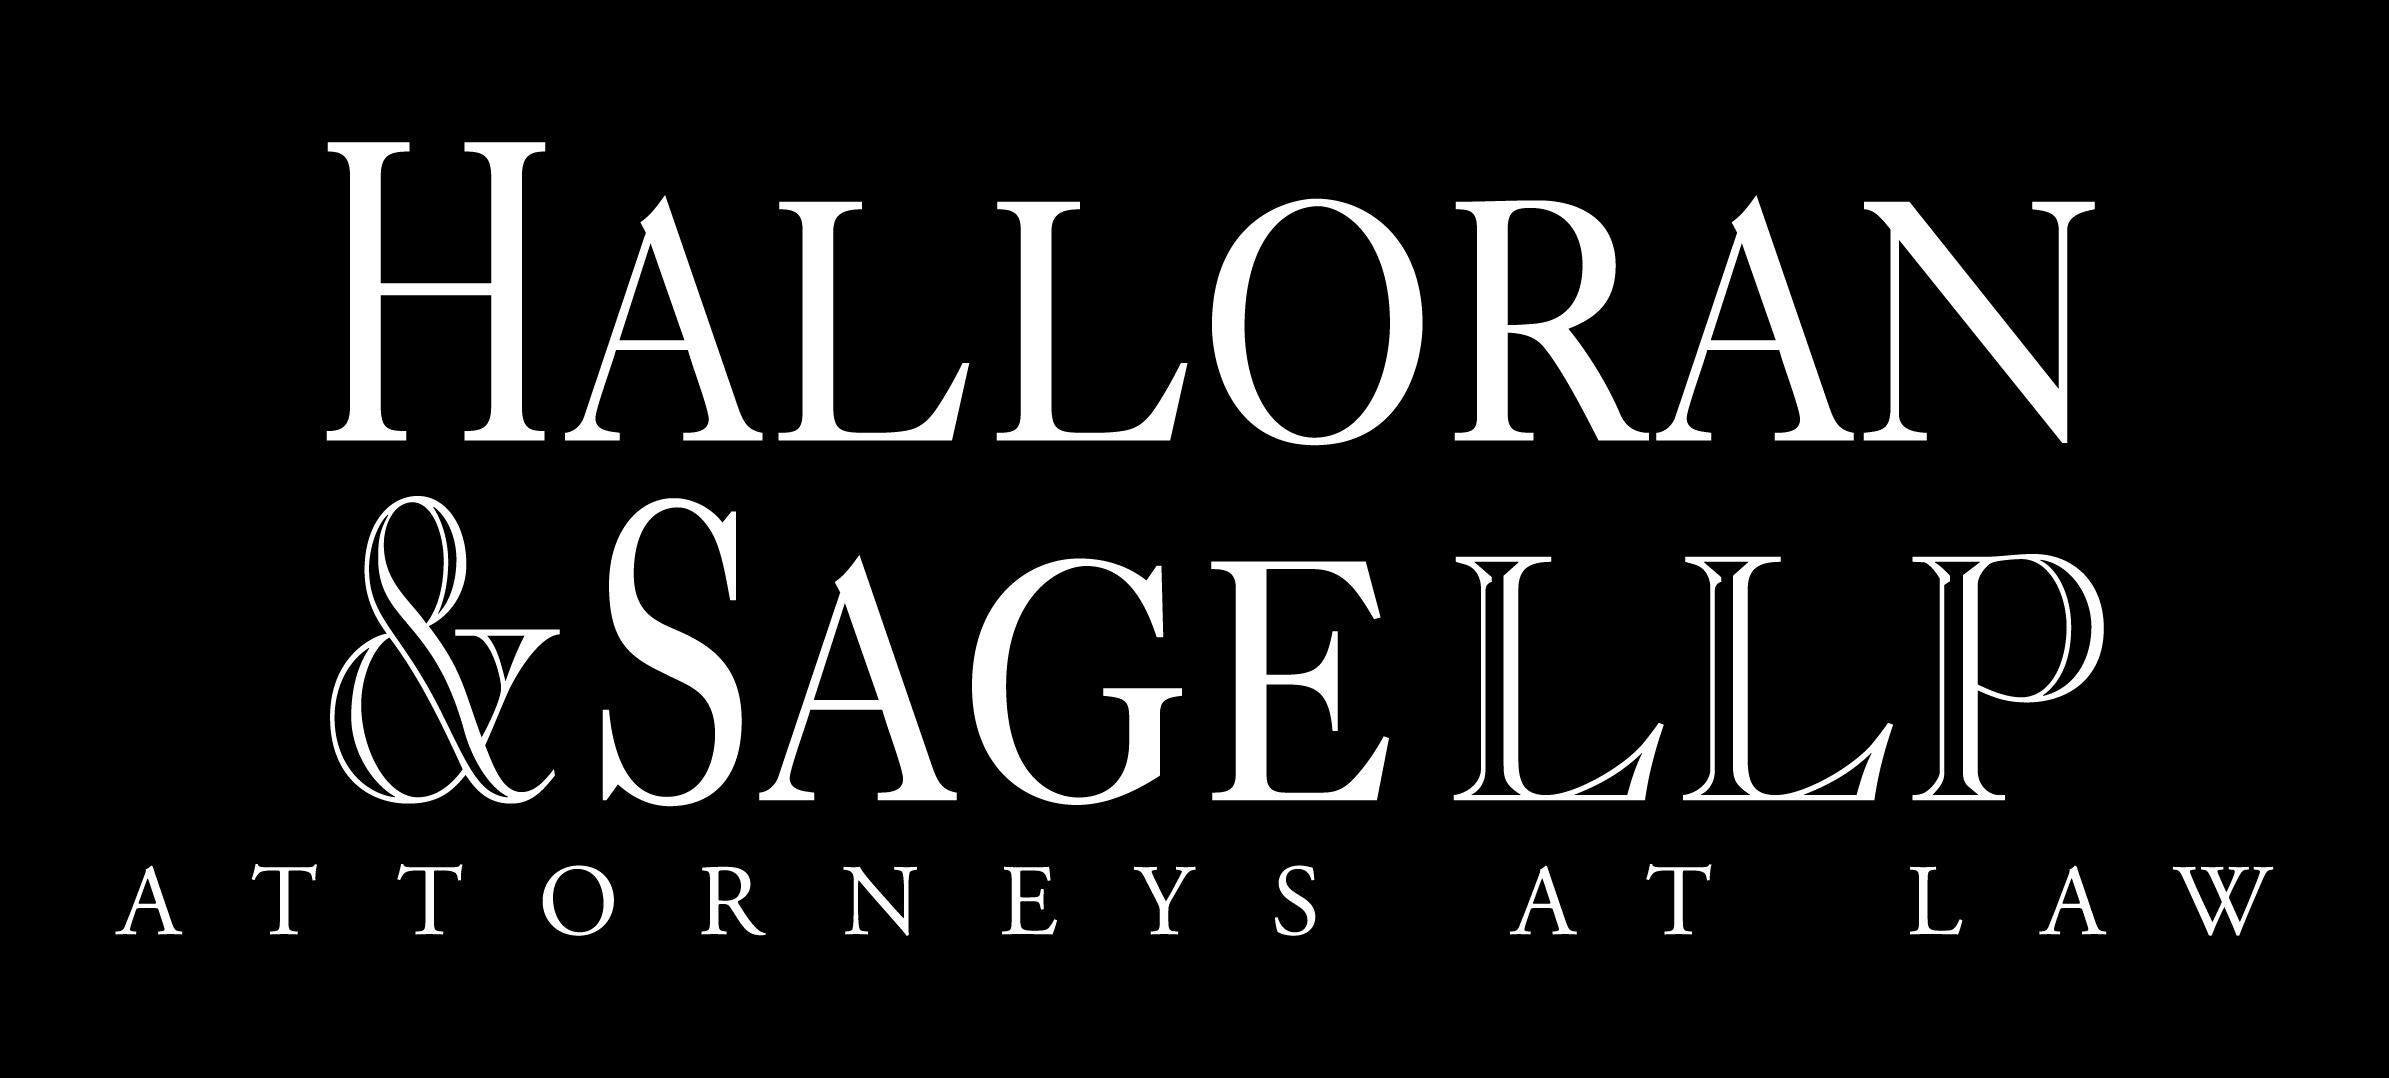 Halloran & Sage, LLP